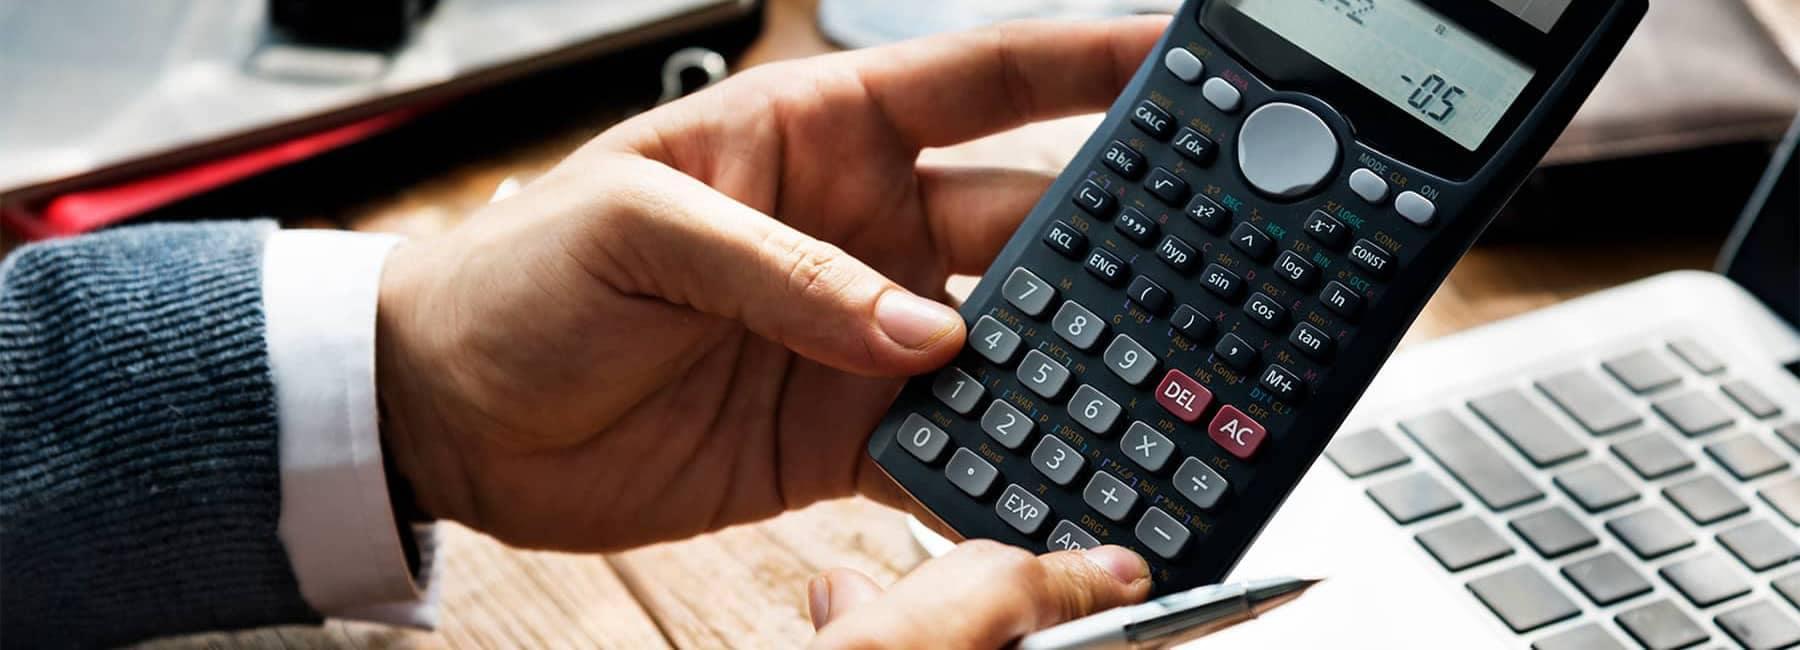 Hands Holding Calculator Dealership